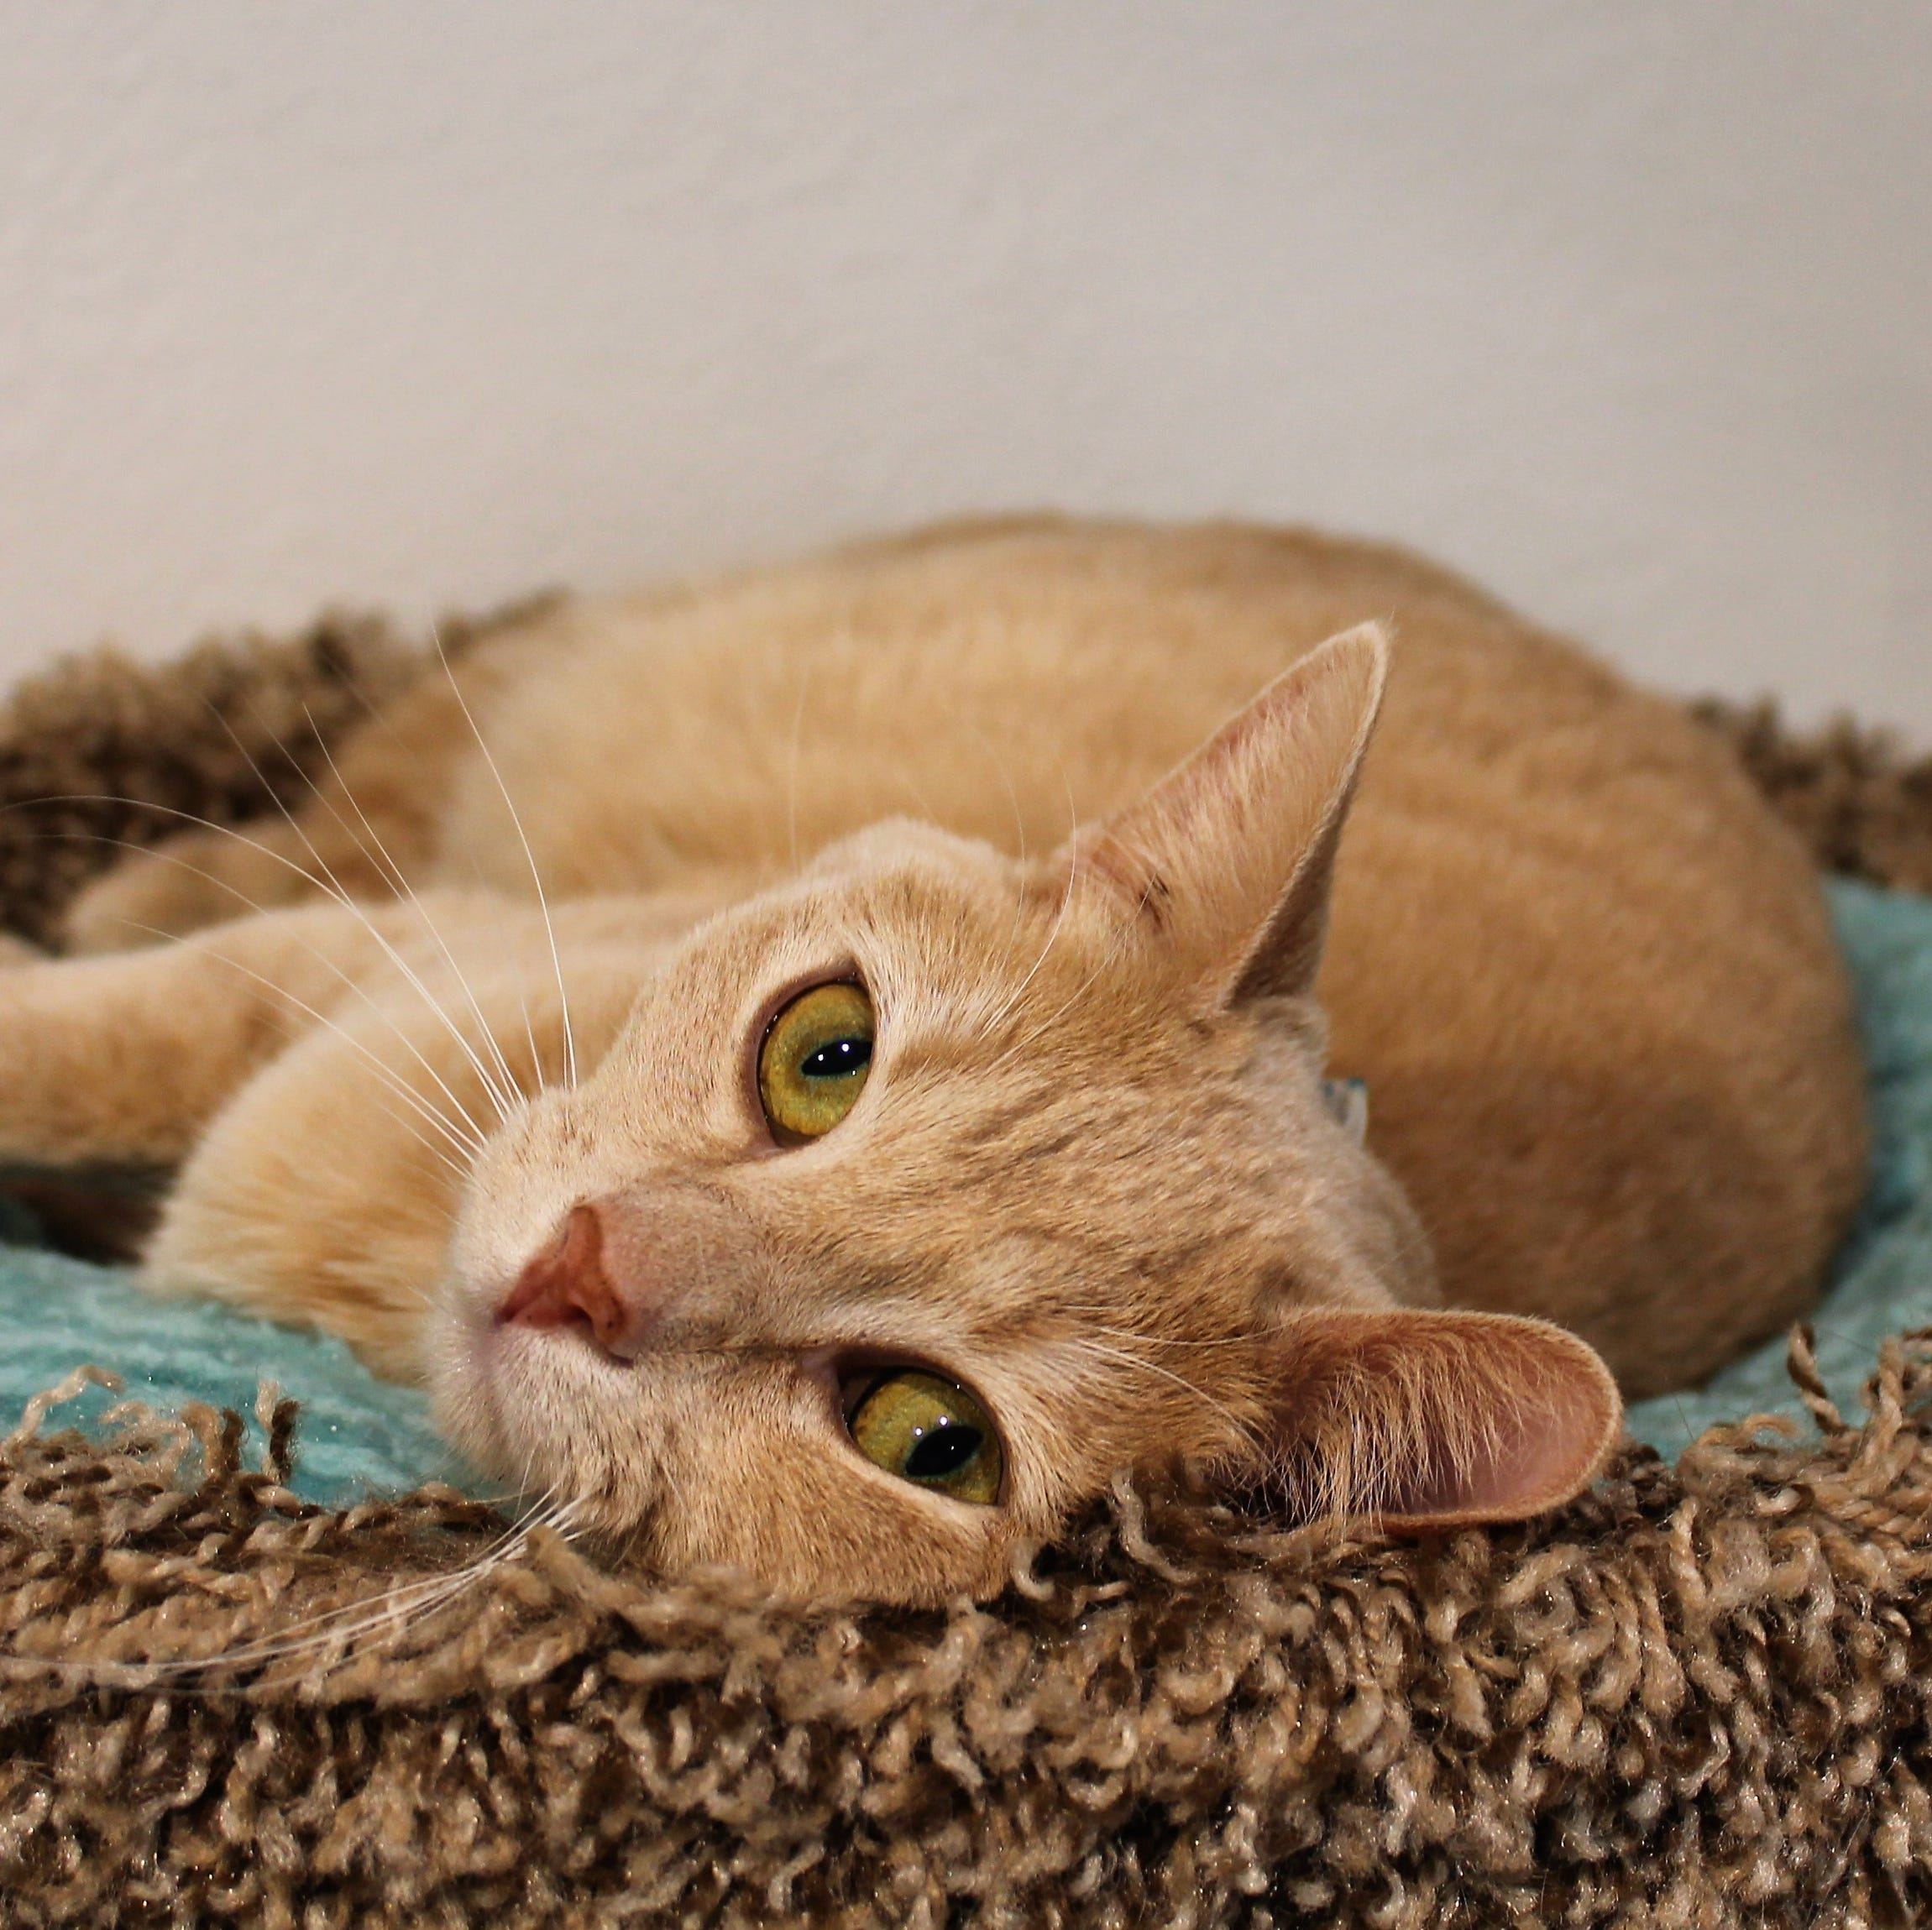 PETA opposed to Alamogordo cat program